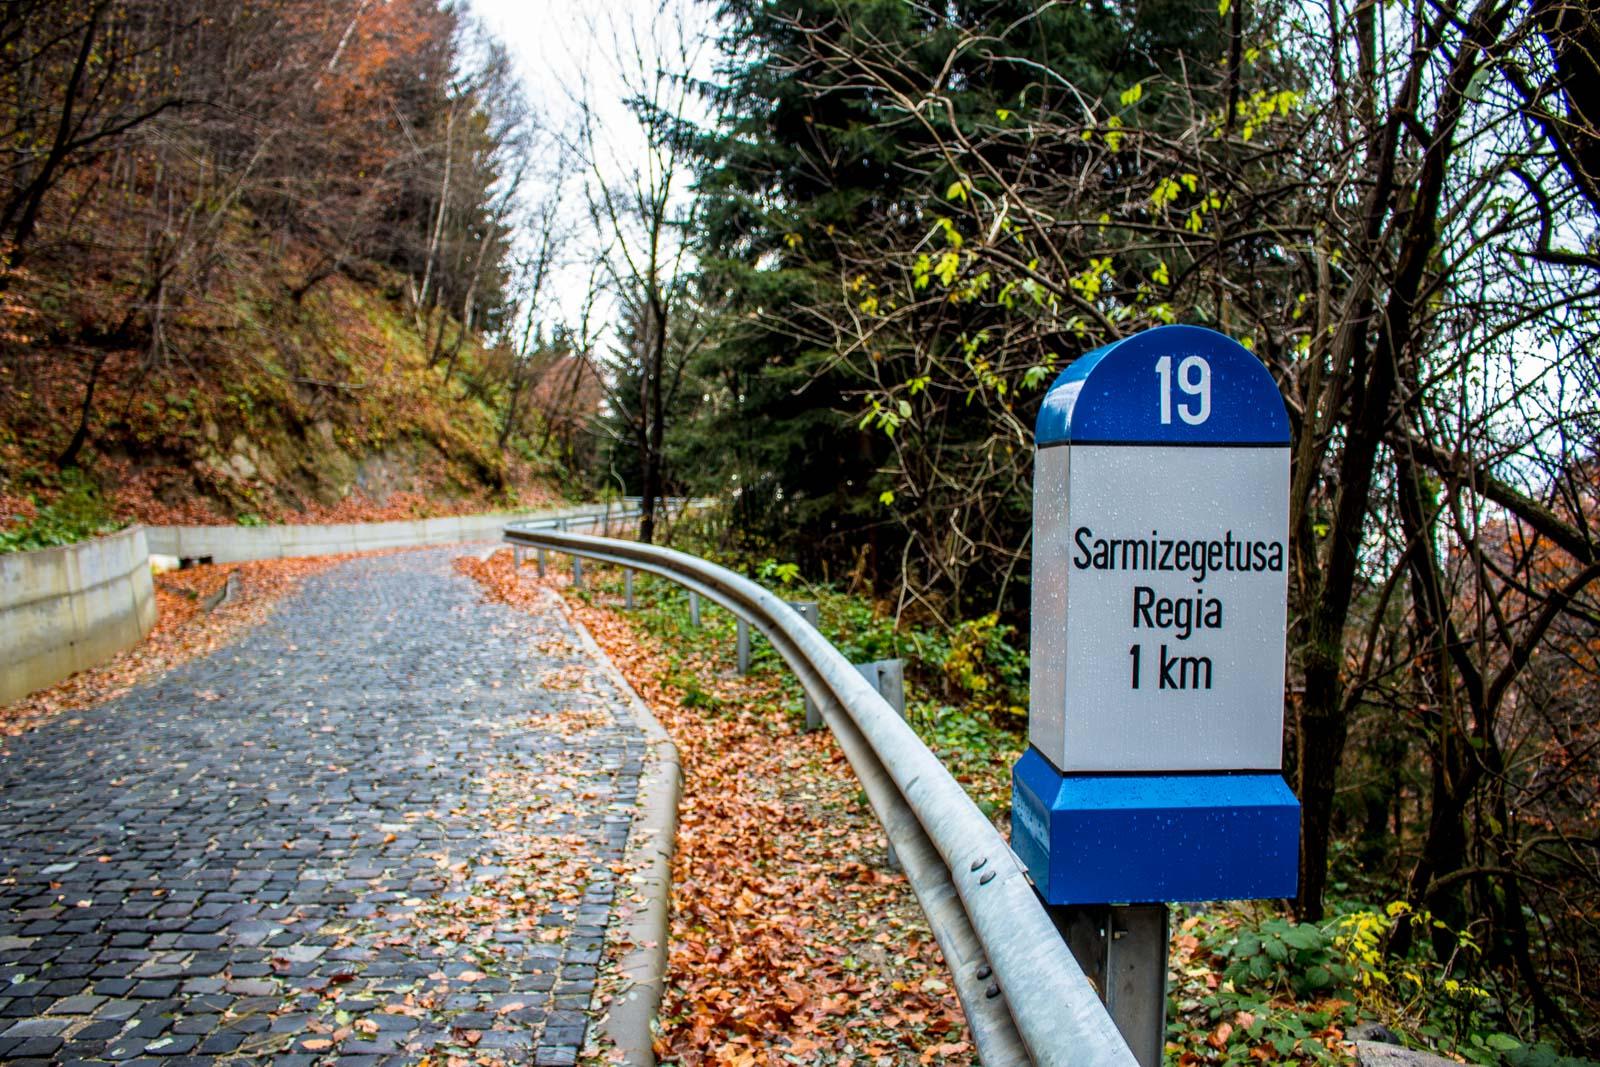 Rumänisches Stonehenge Sarmizegetusa Regia Anfahrt